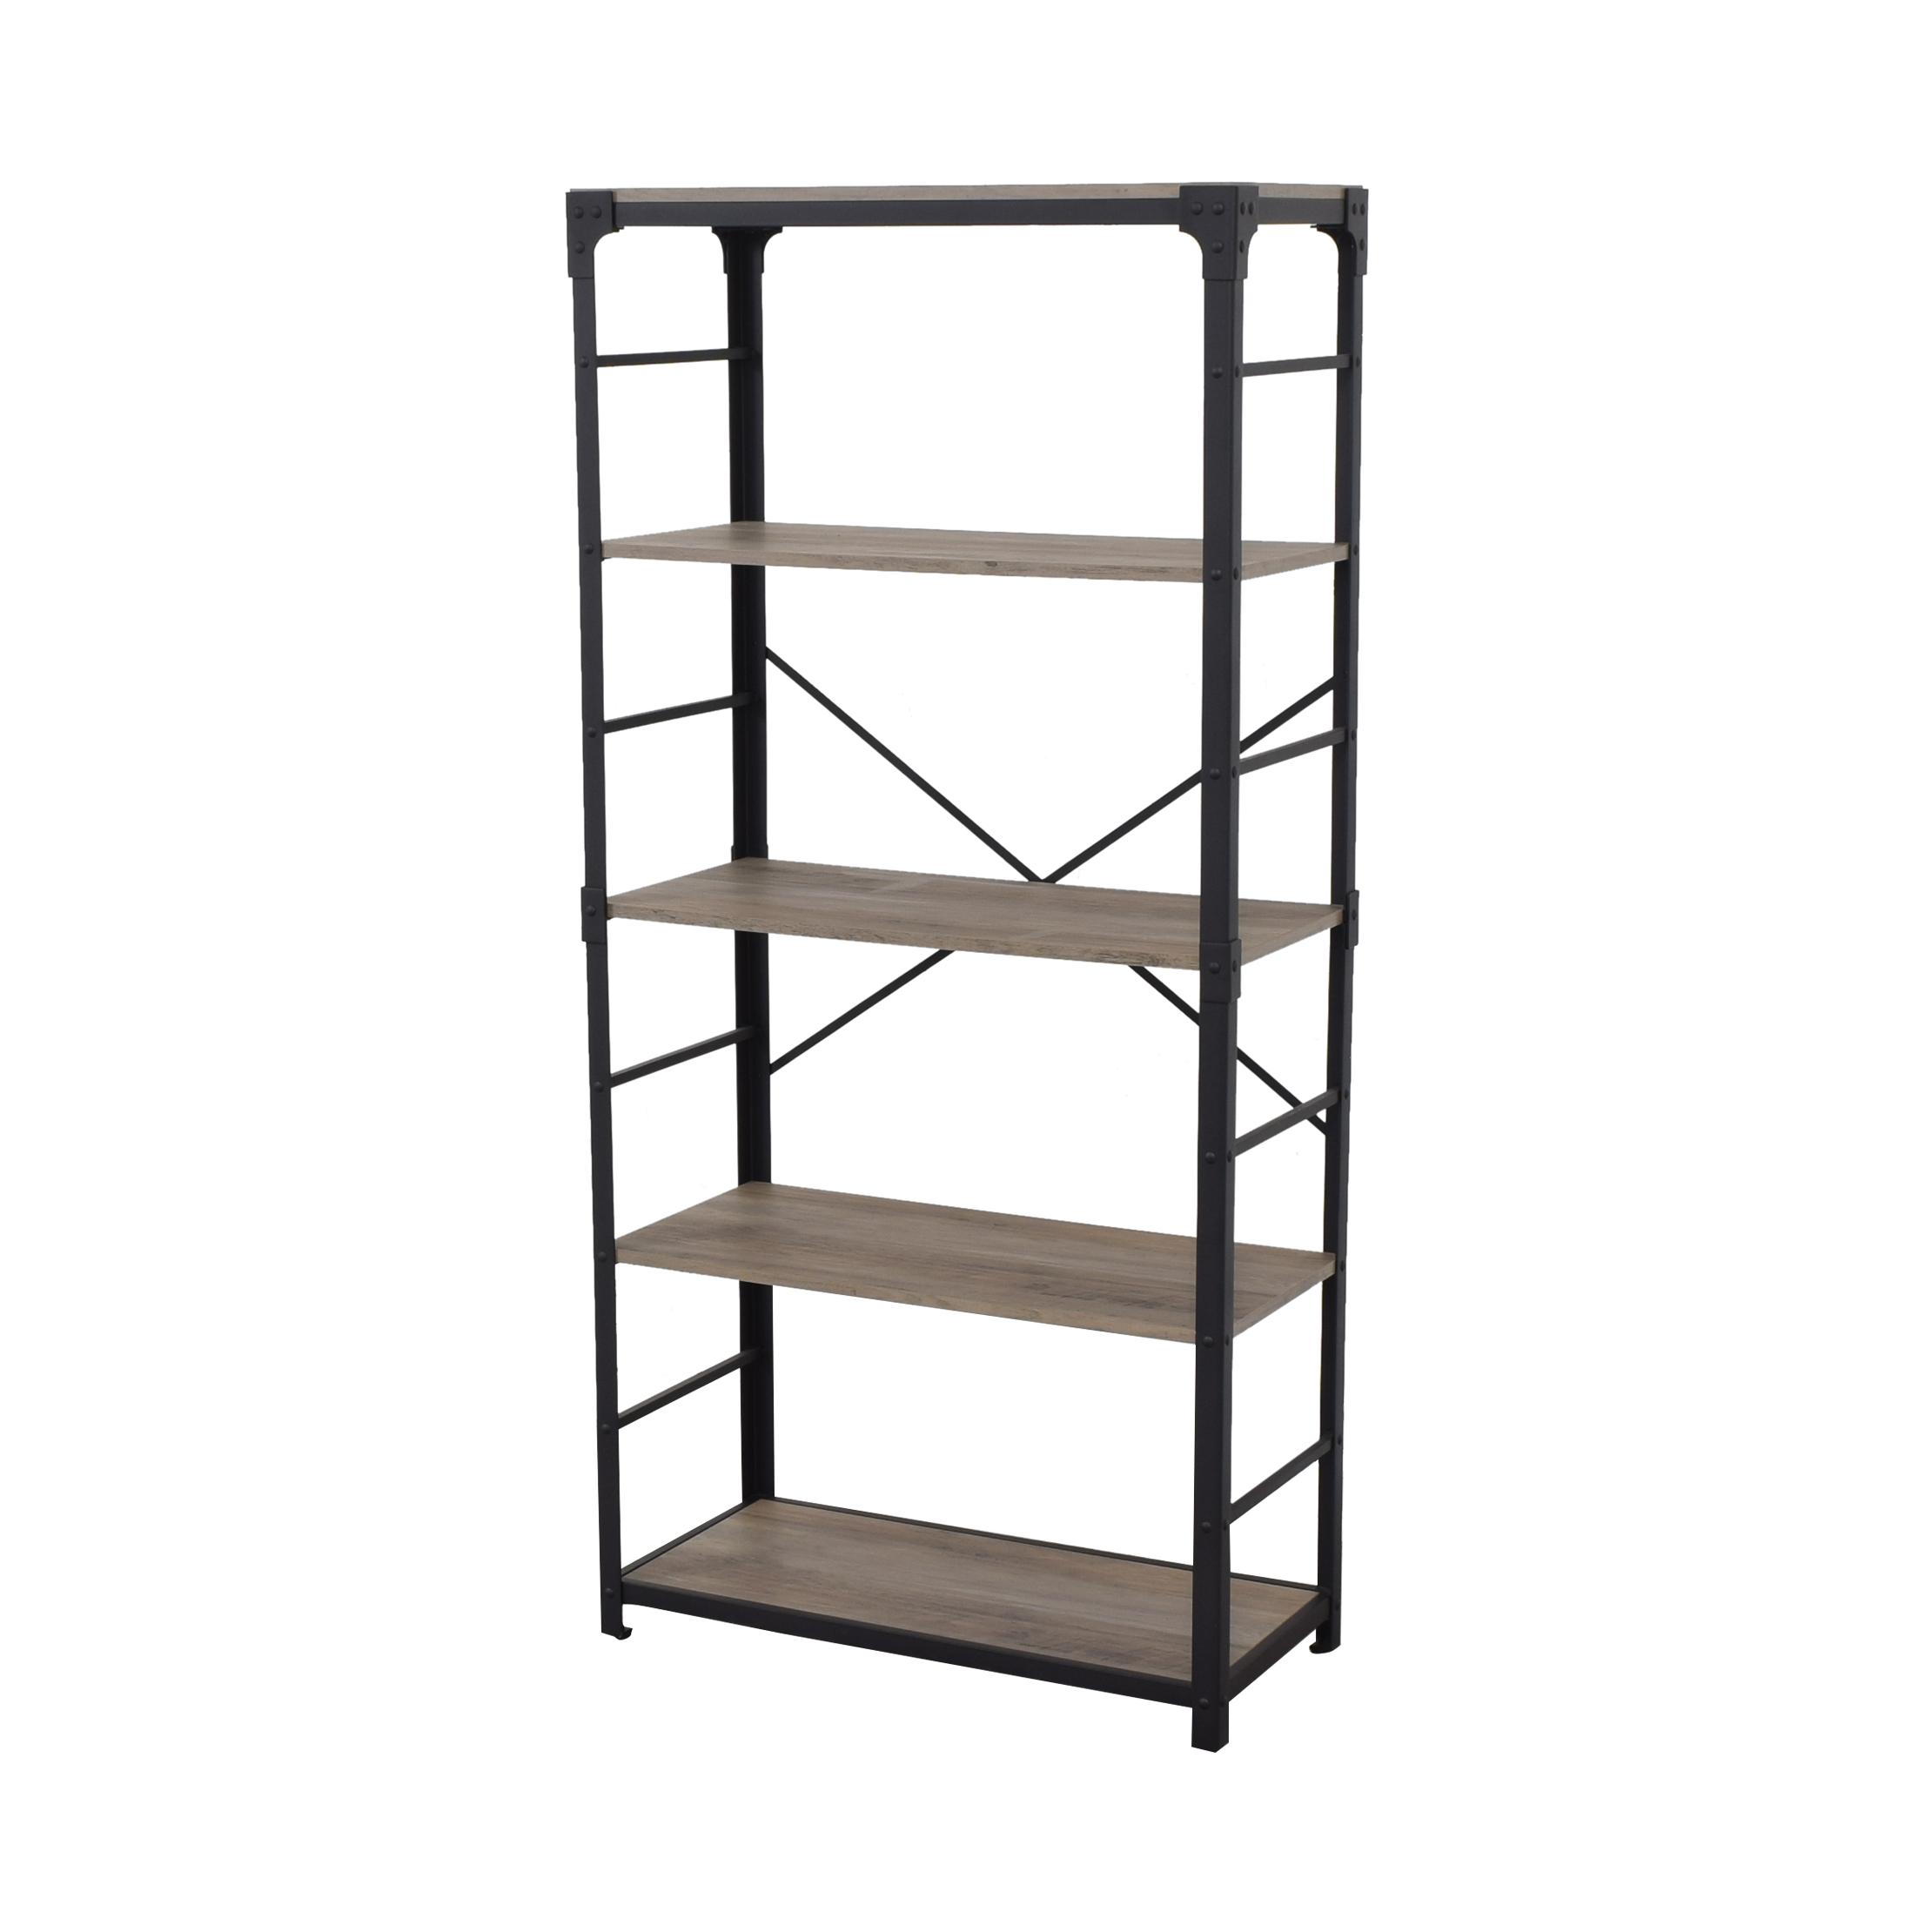 buy Room & Board Room & Board Bookshelf online